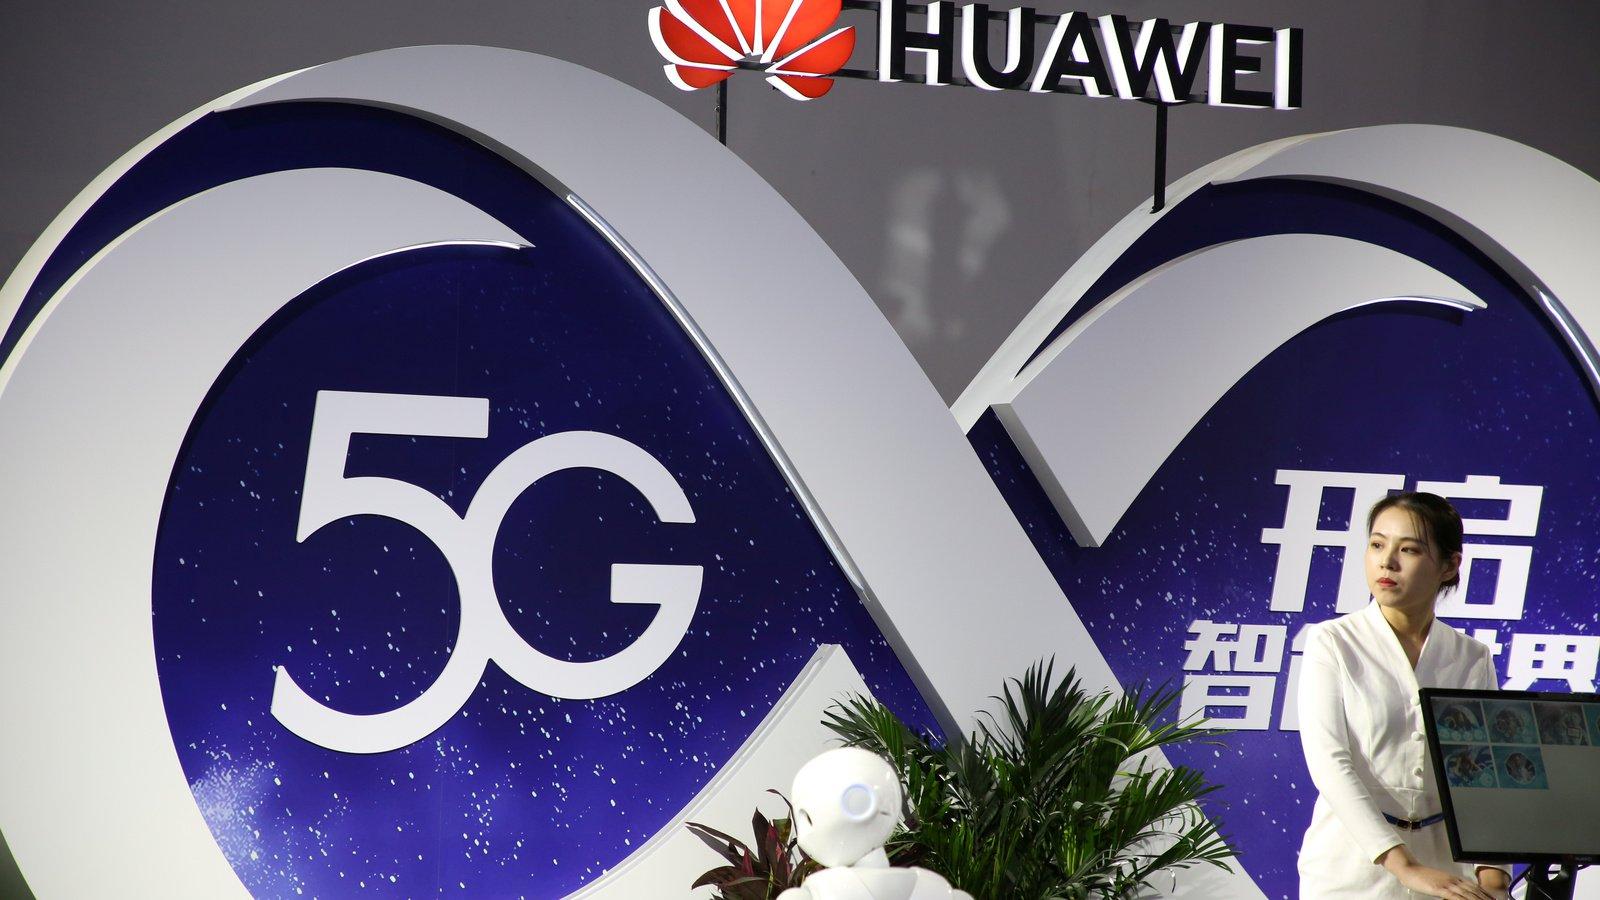 Huawei 5G banned in UK